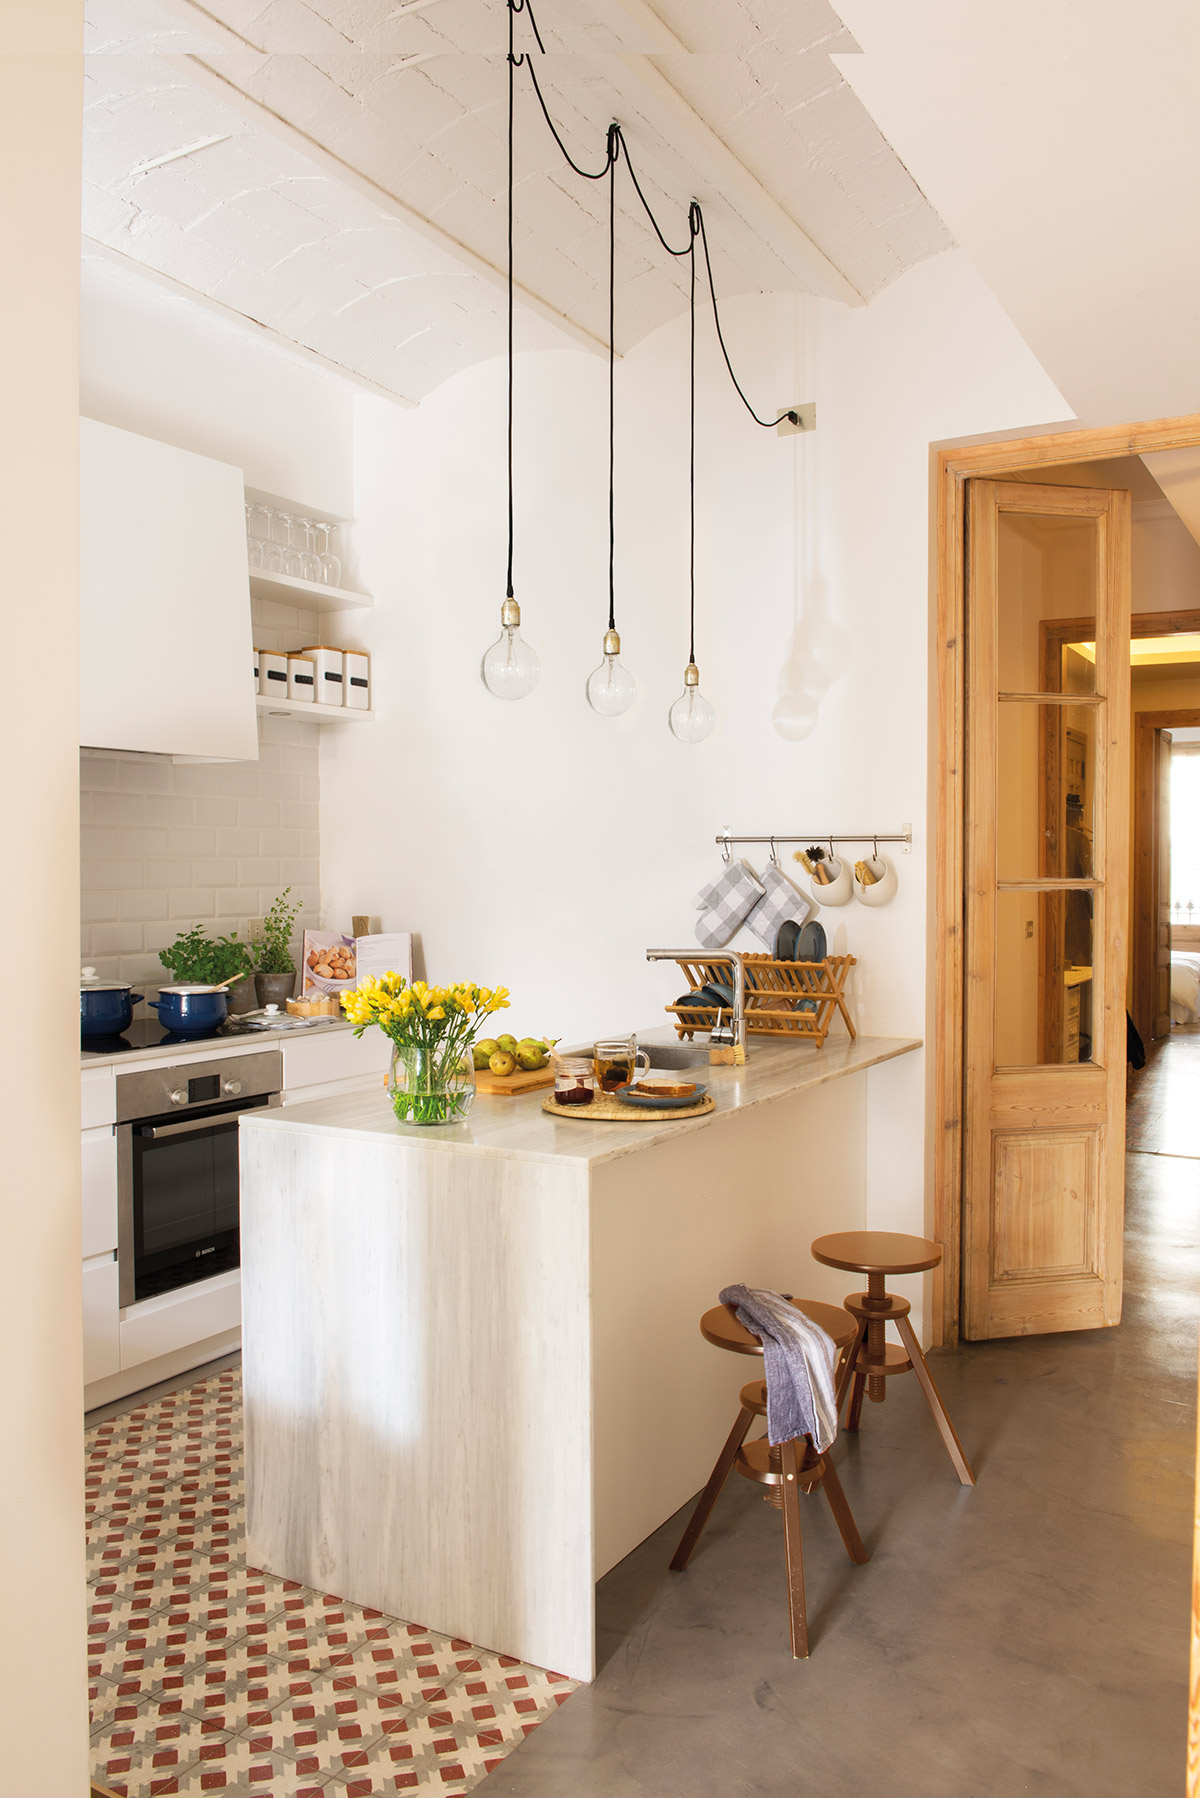 Dise o de una cocina con barra de desayuno for Barras para cocinas pequenas modernas